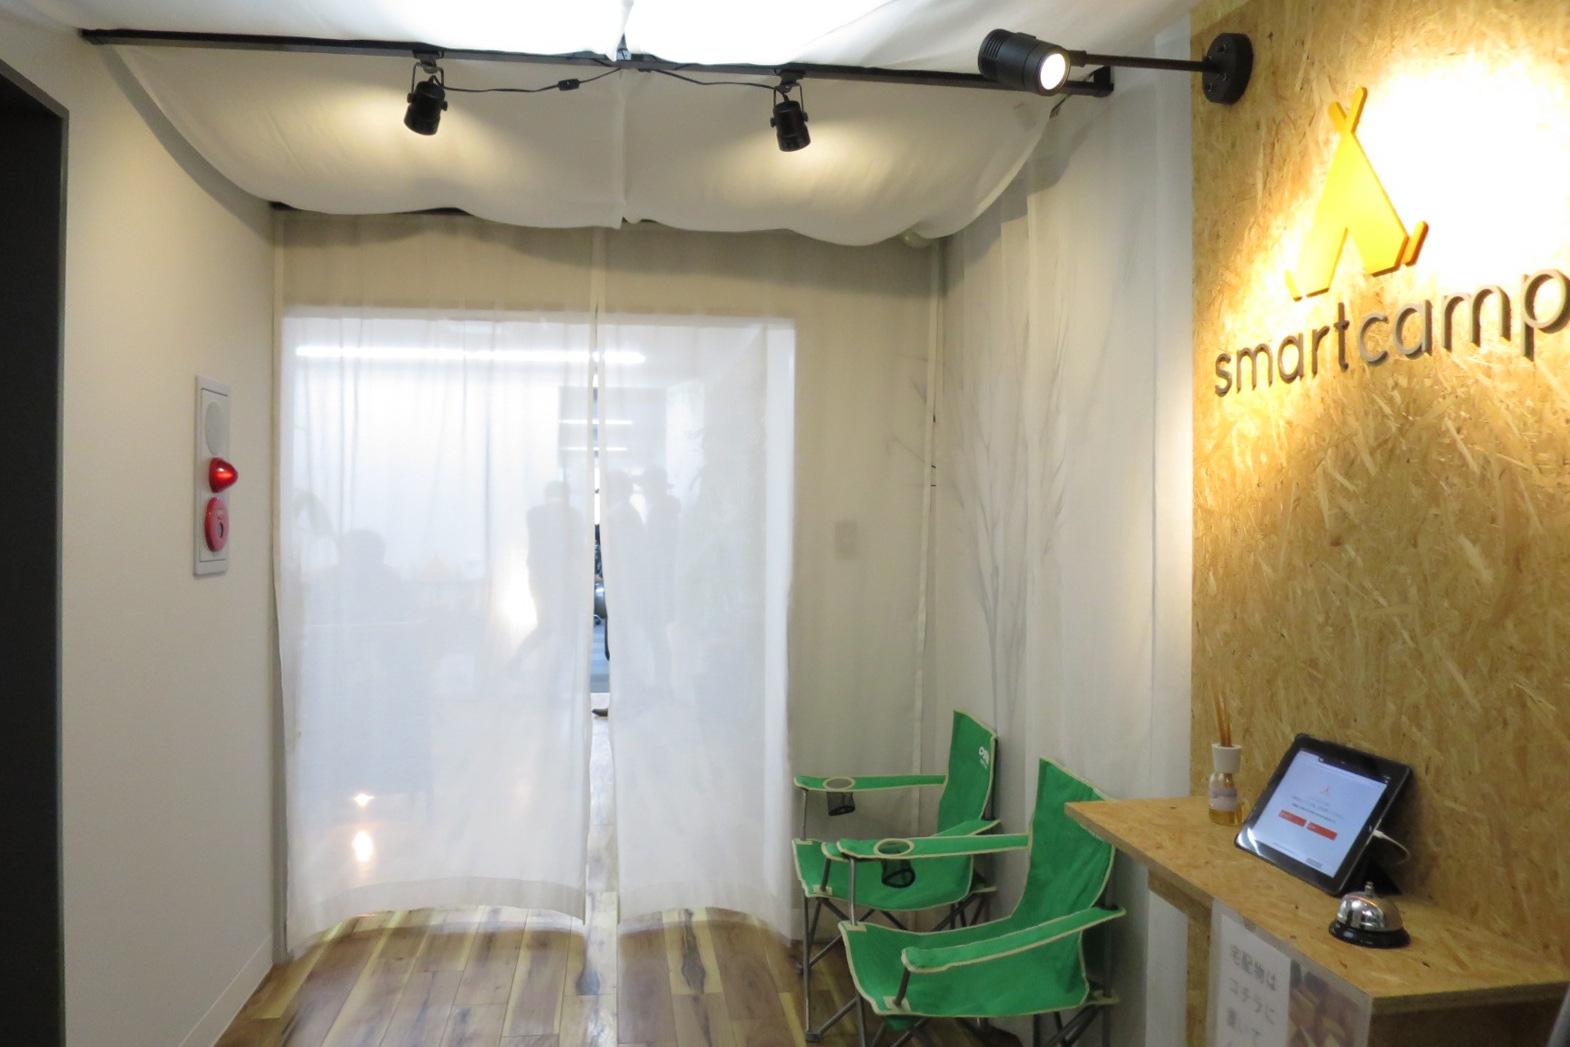 smartcamp_album6